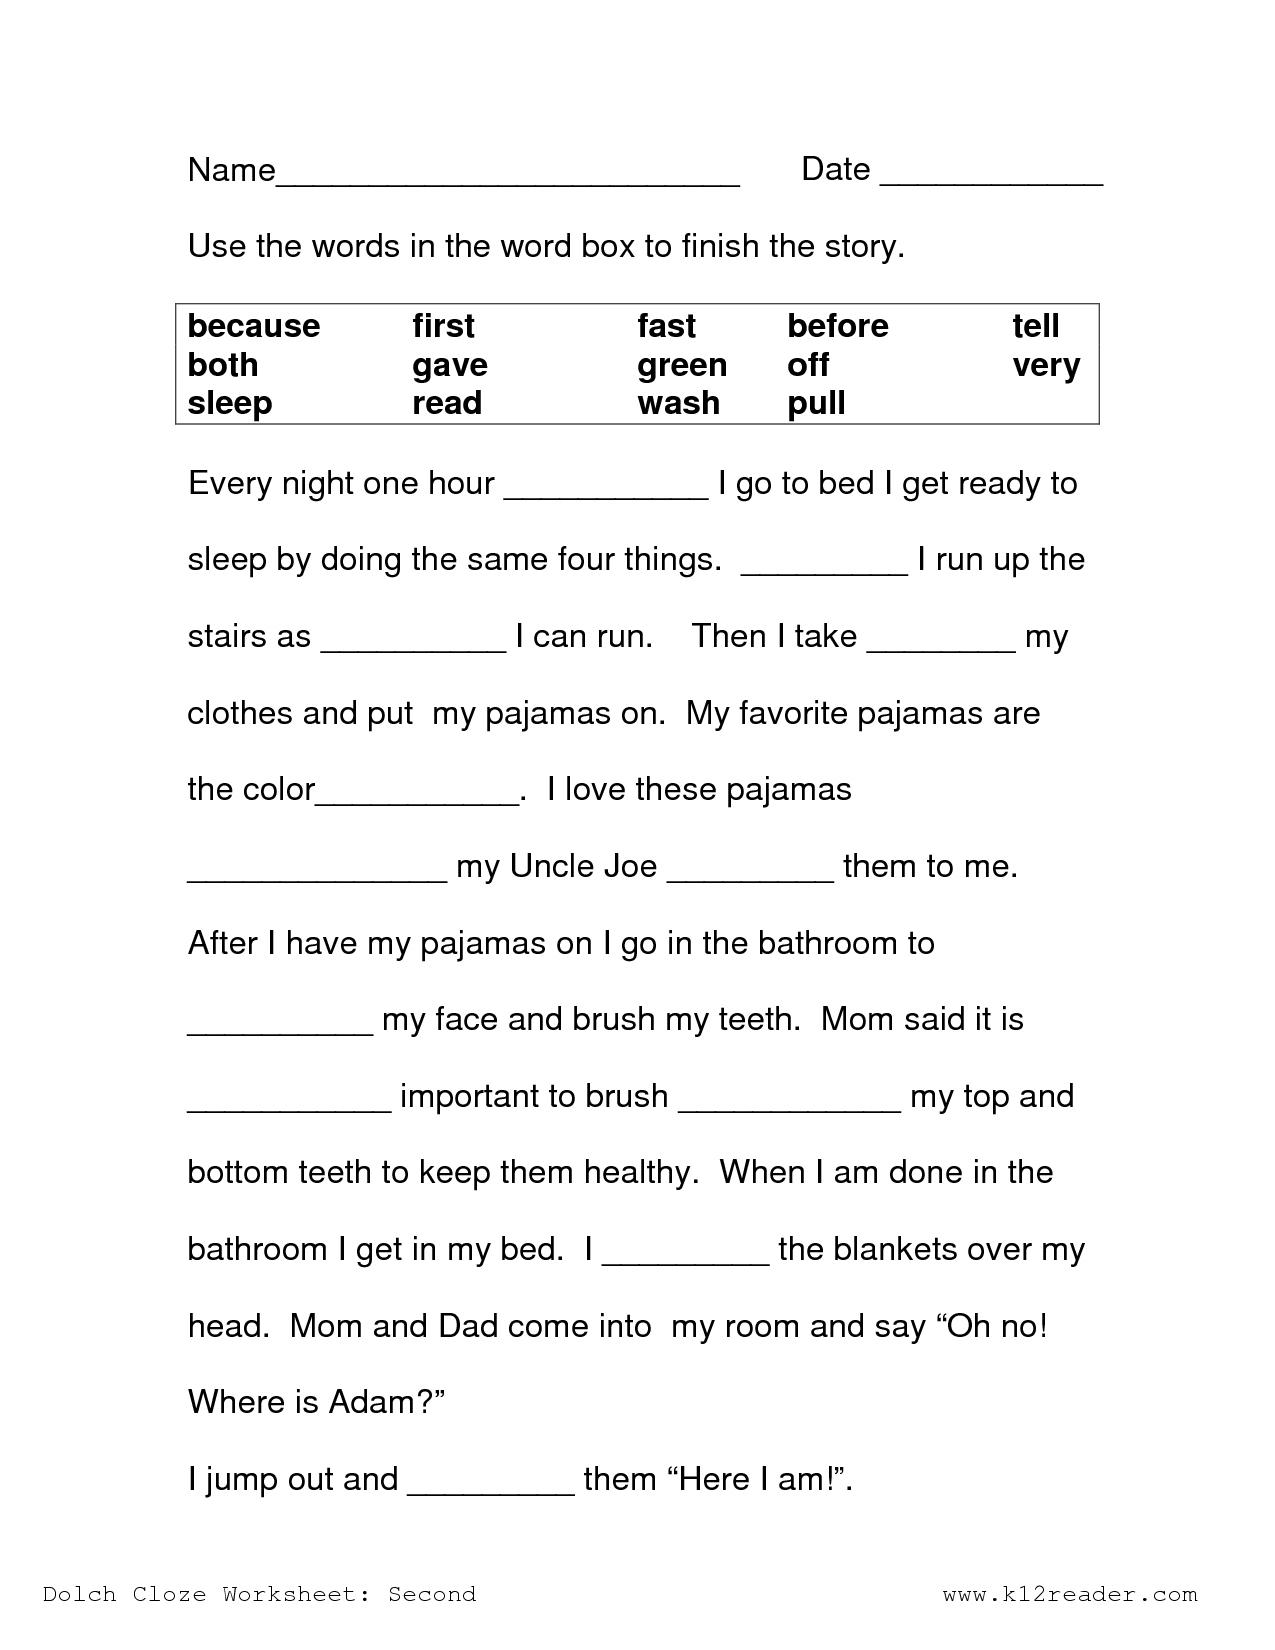 Math Worksheet: 2Nd Grade Science Worksheets Free Printable Easy - 4Th Grade Printable Crossword Puzzles